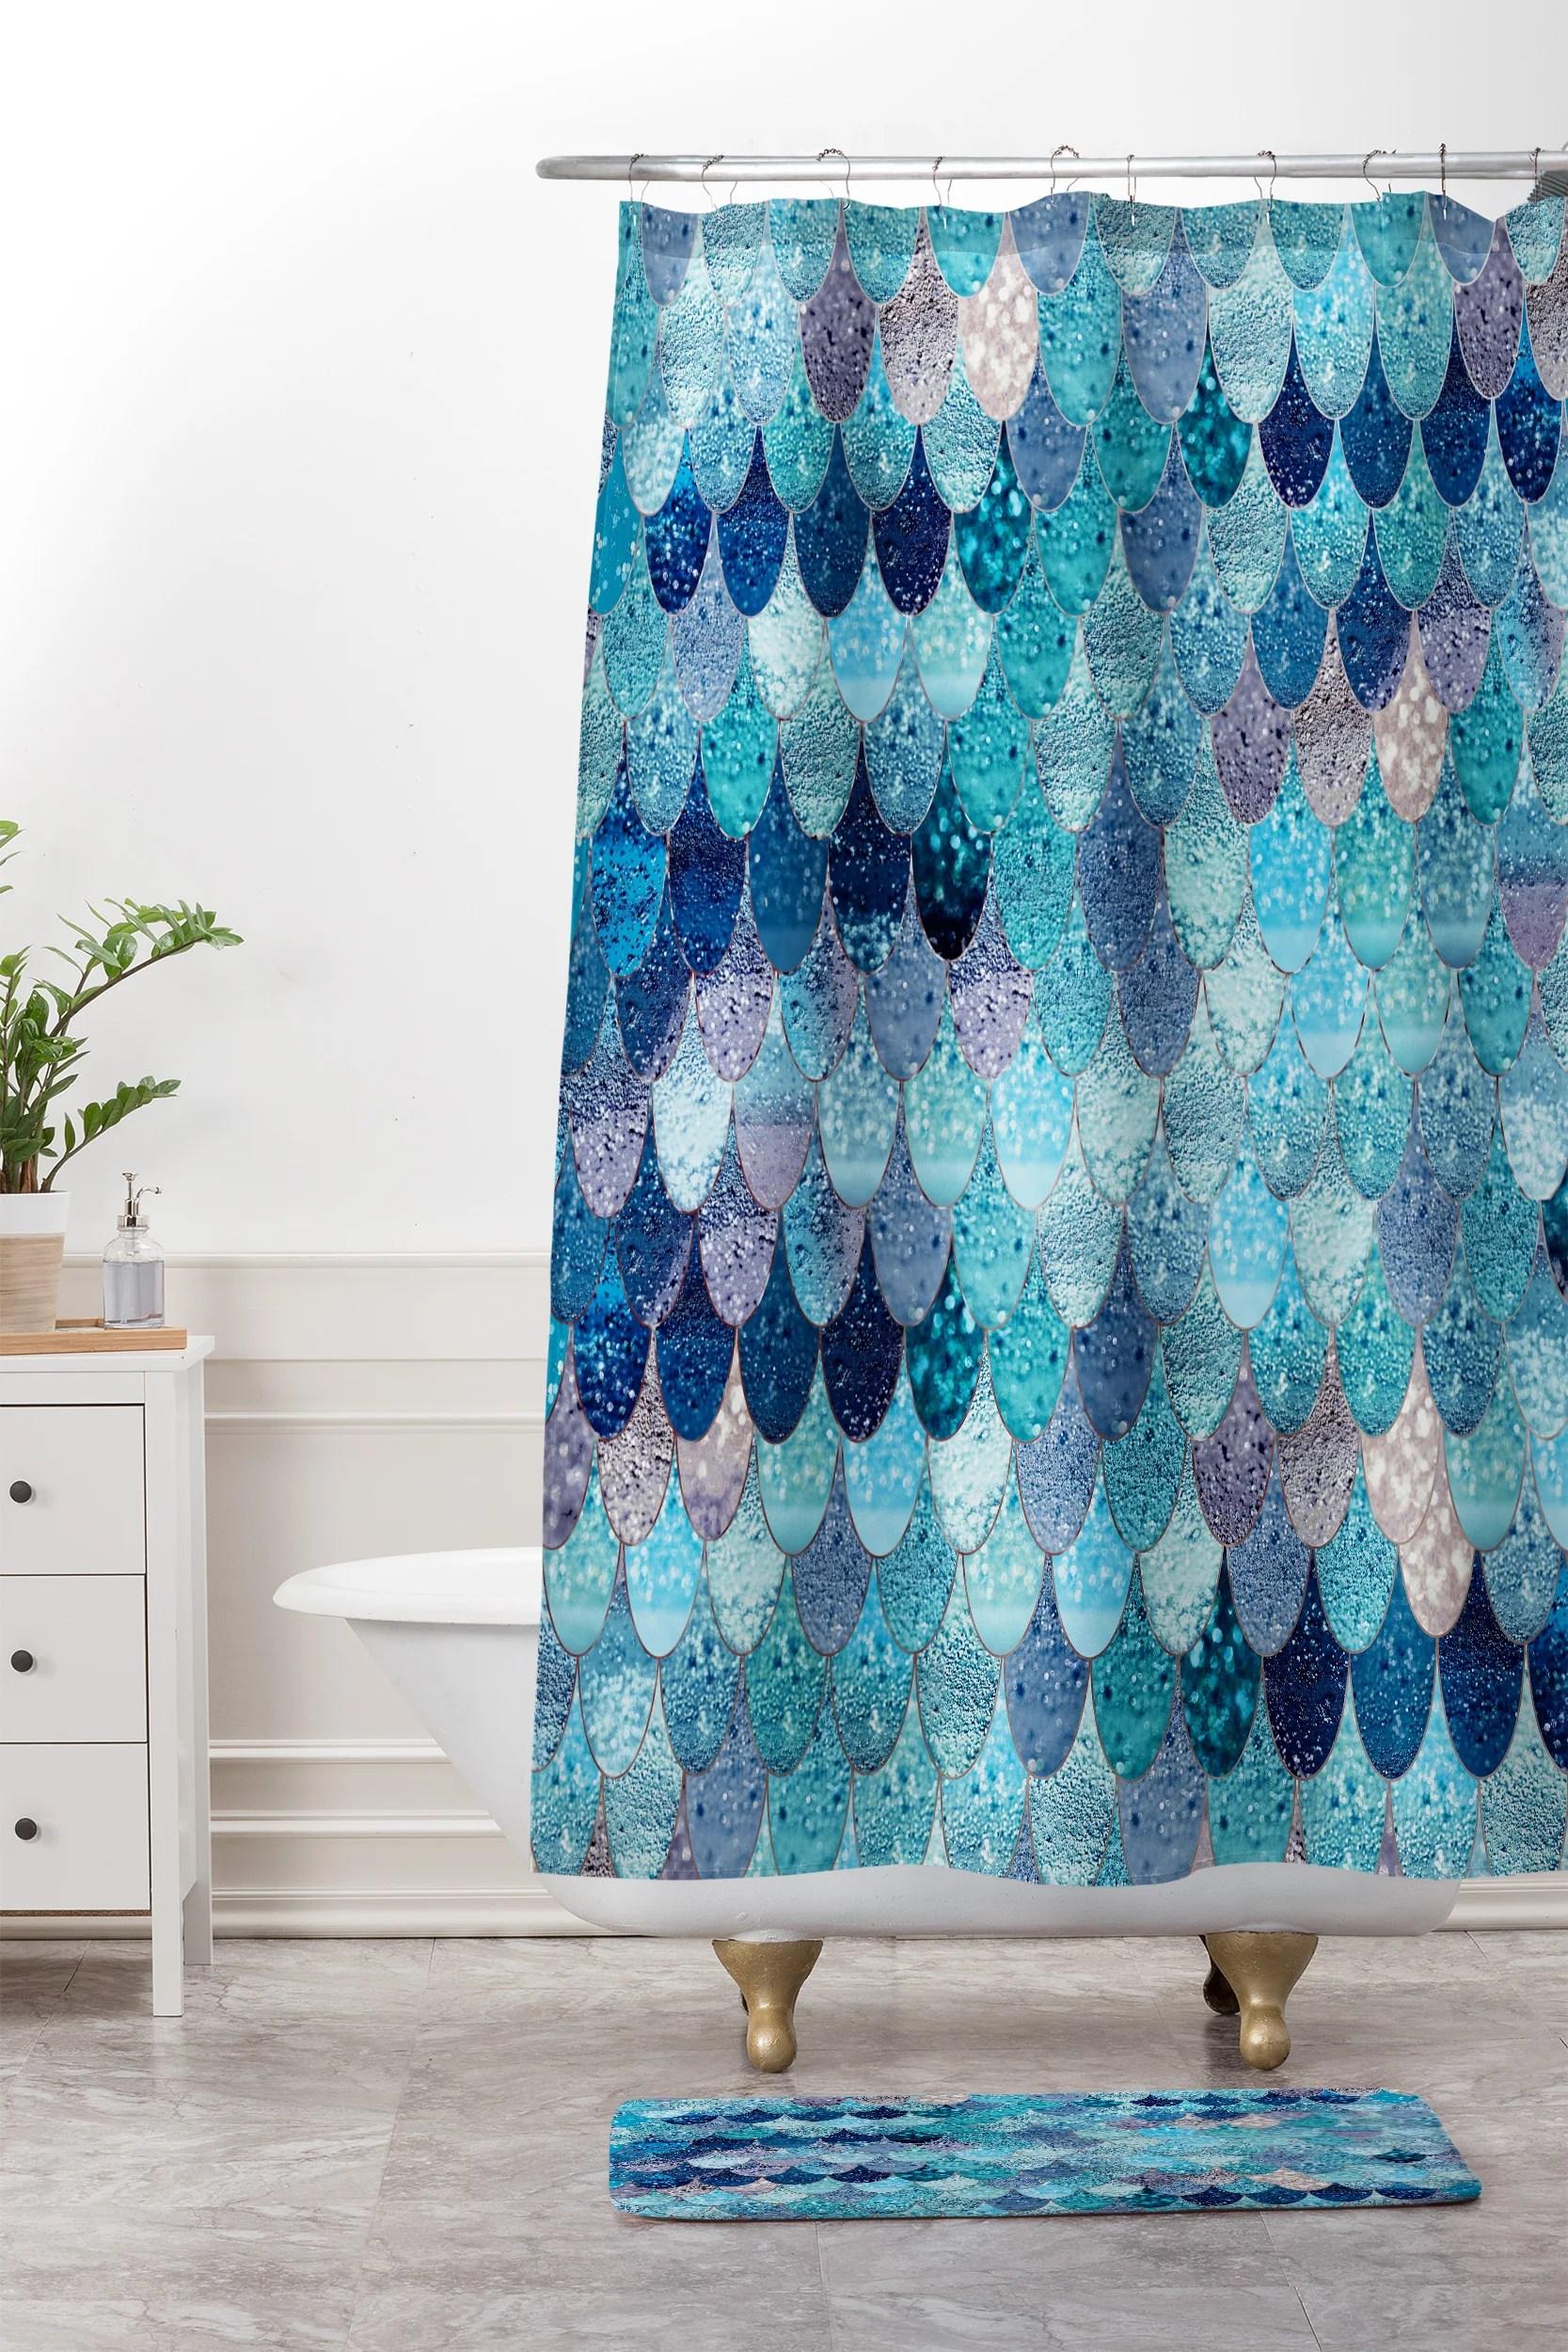 Horrible Shower Curtain Mat V1 6fc3b4a9 E978 4204 939b 44c743070800 Ombre Shower Curtain Shower Curtain Canada Monika Strigel Summer Mermaid Blue houzz 01 Teal Shower Curtain